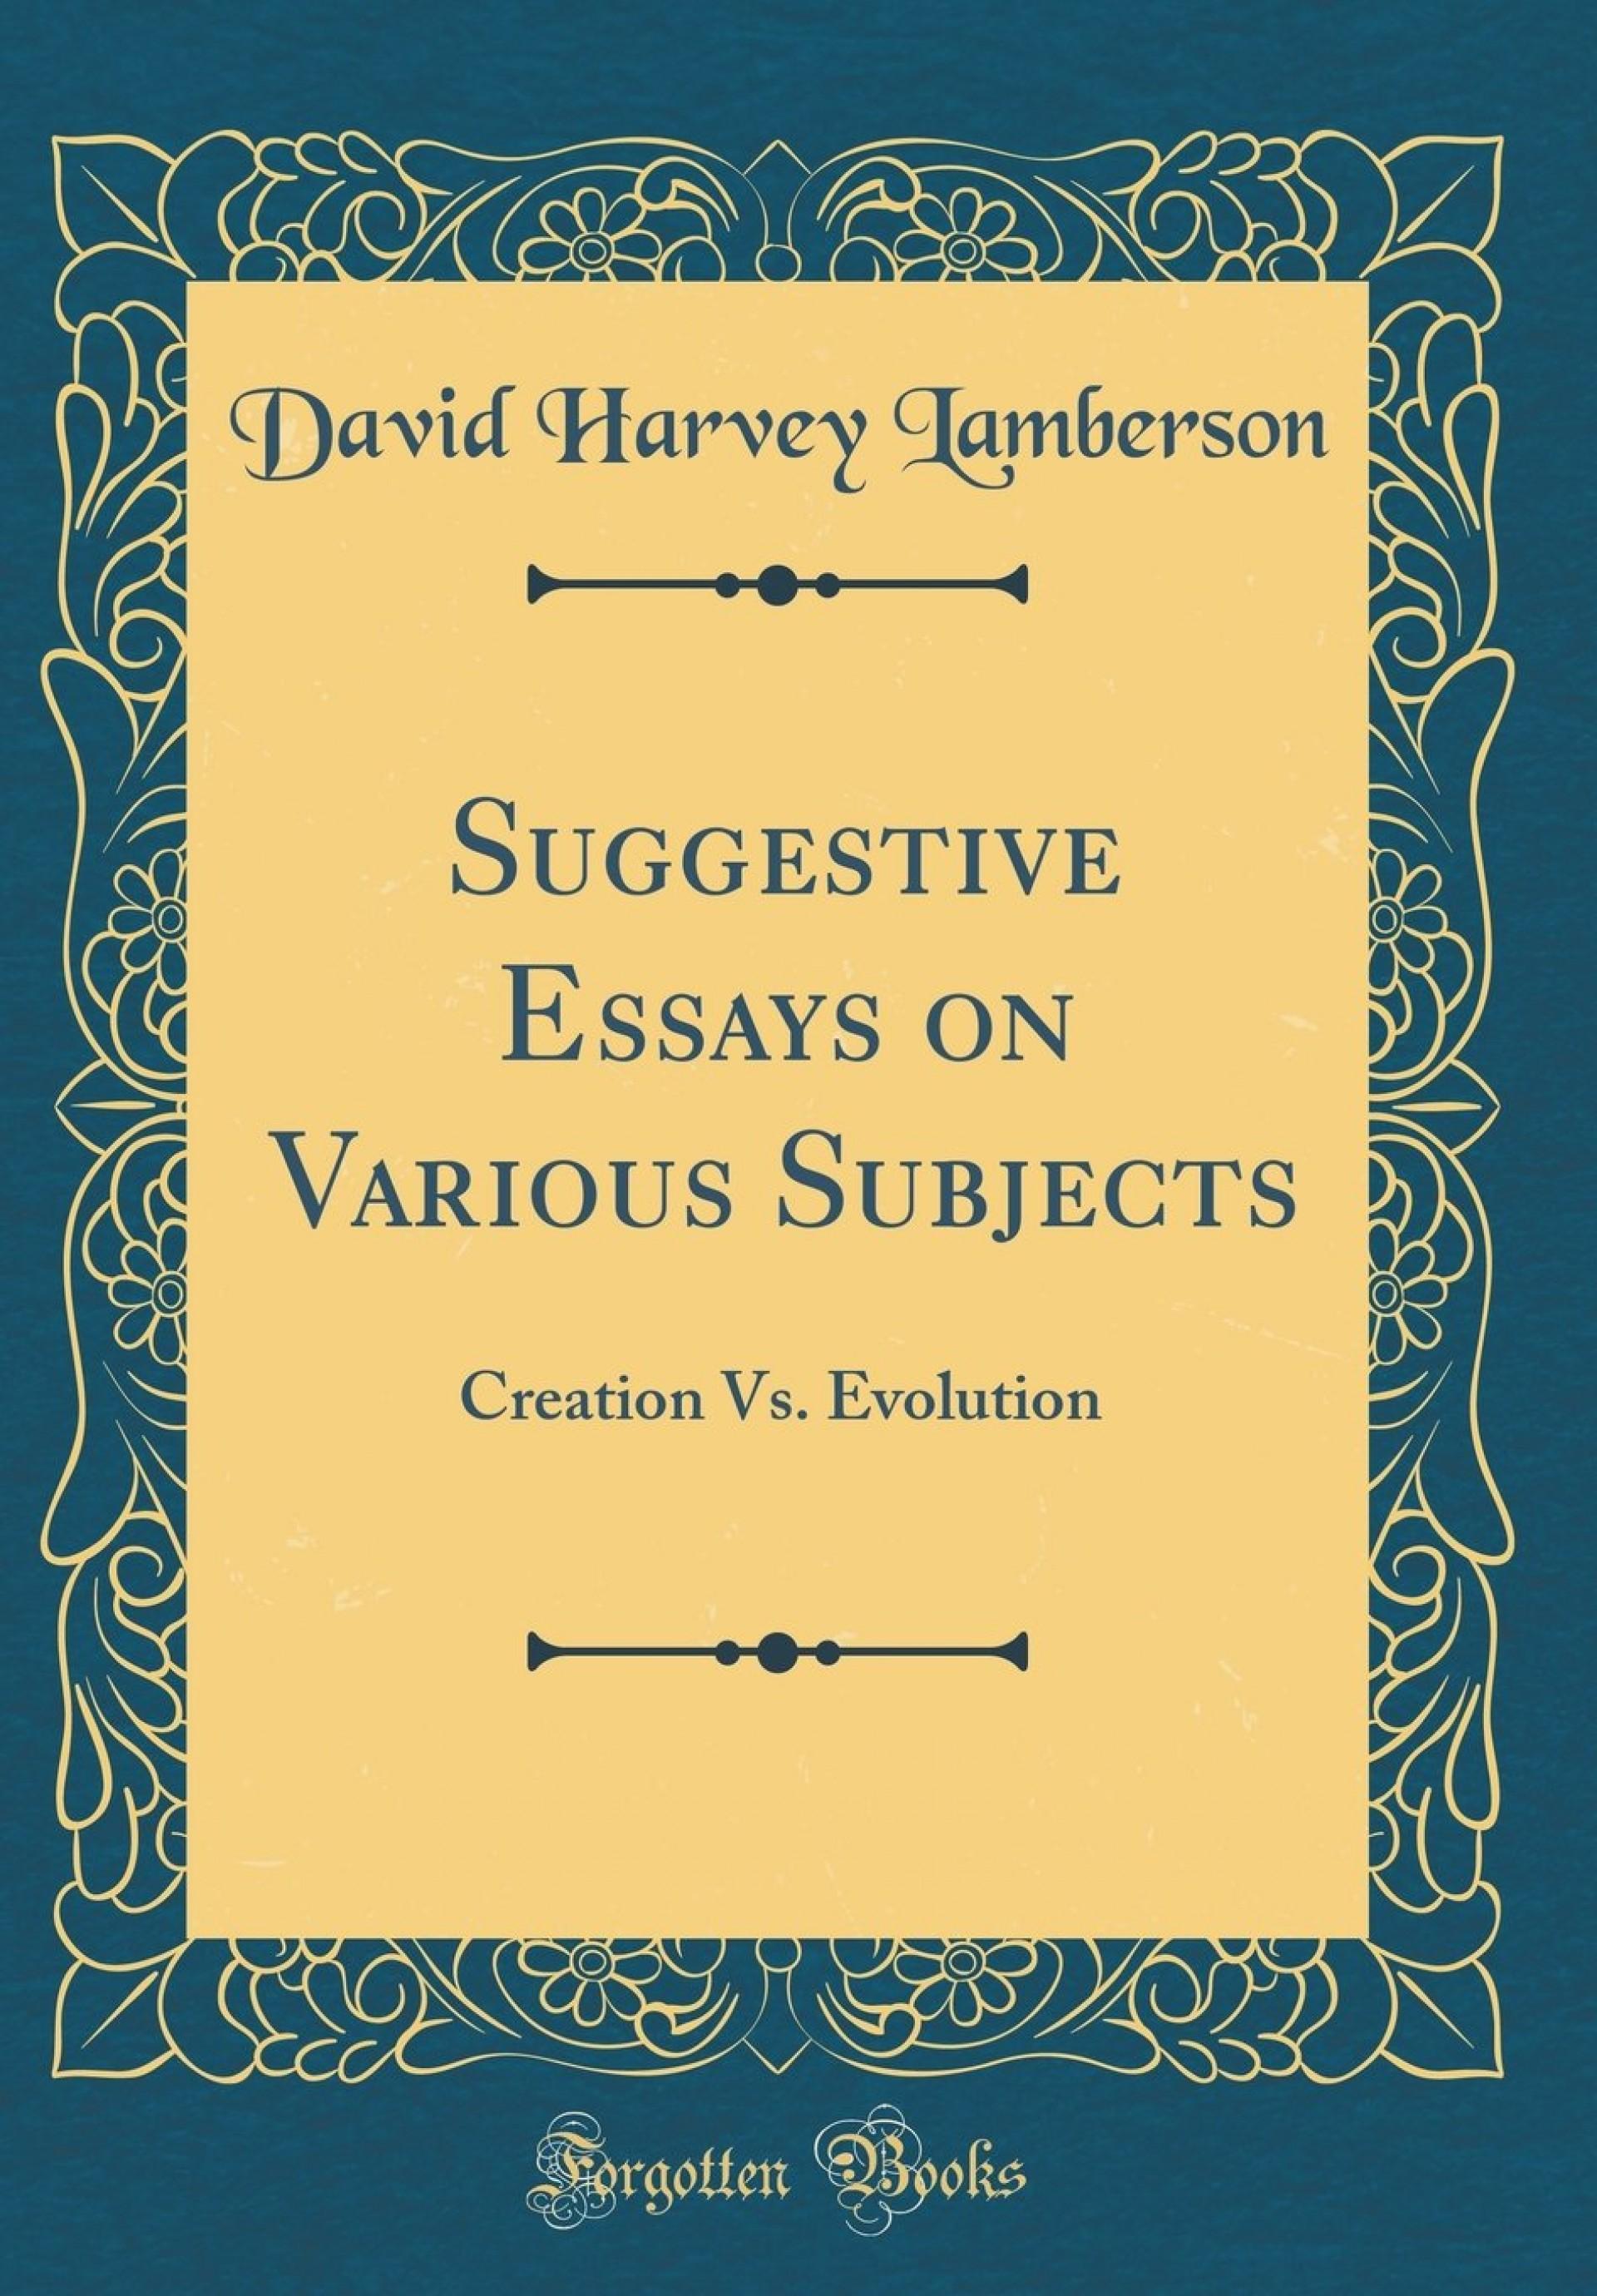 018 71btf9d2 Jl Creation Vs Evolution Essay Stupendous Pdf Essays On Origins Vs. 1920